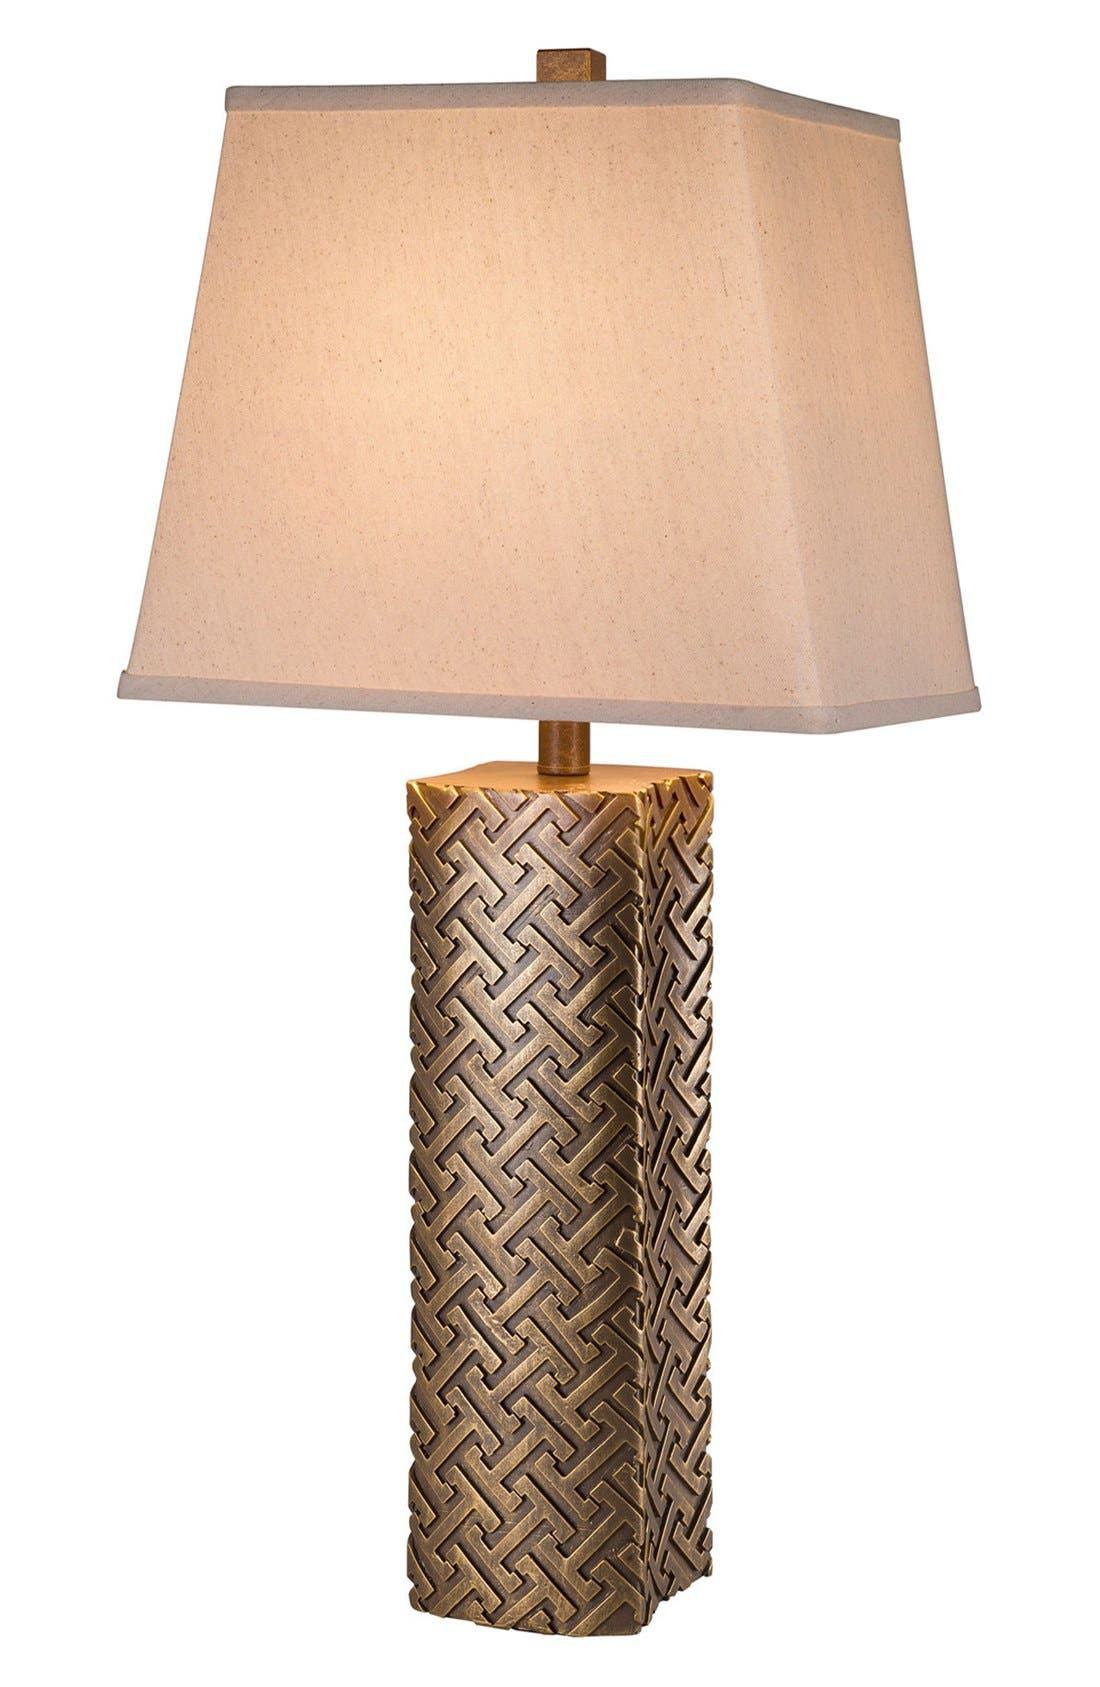 Main Image - JAlexander Geometric Metallic Table Lamp